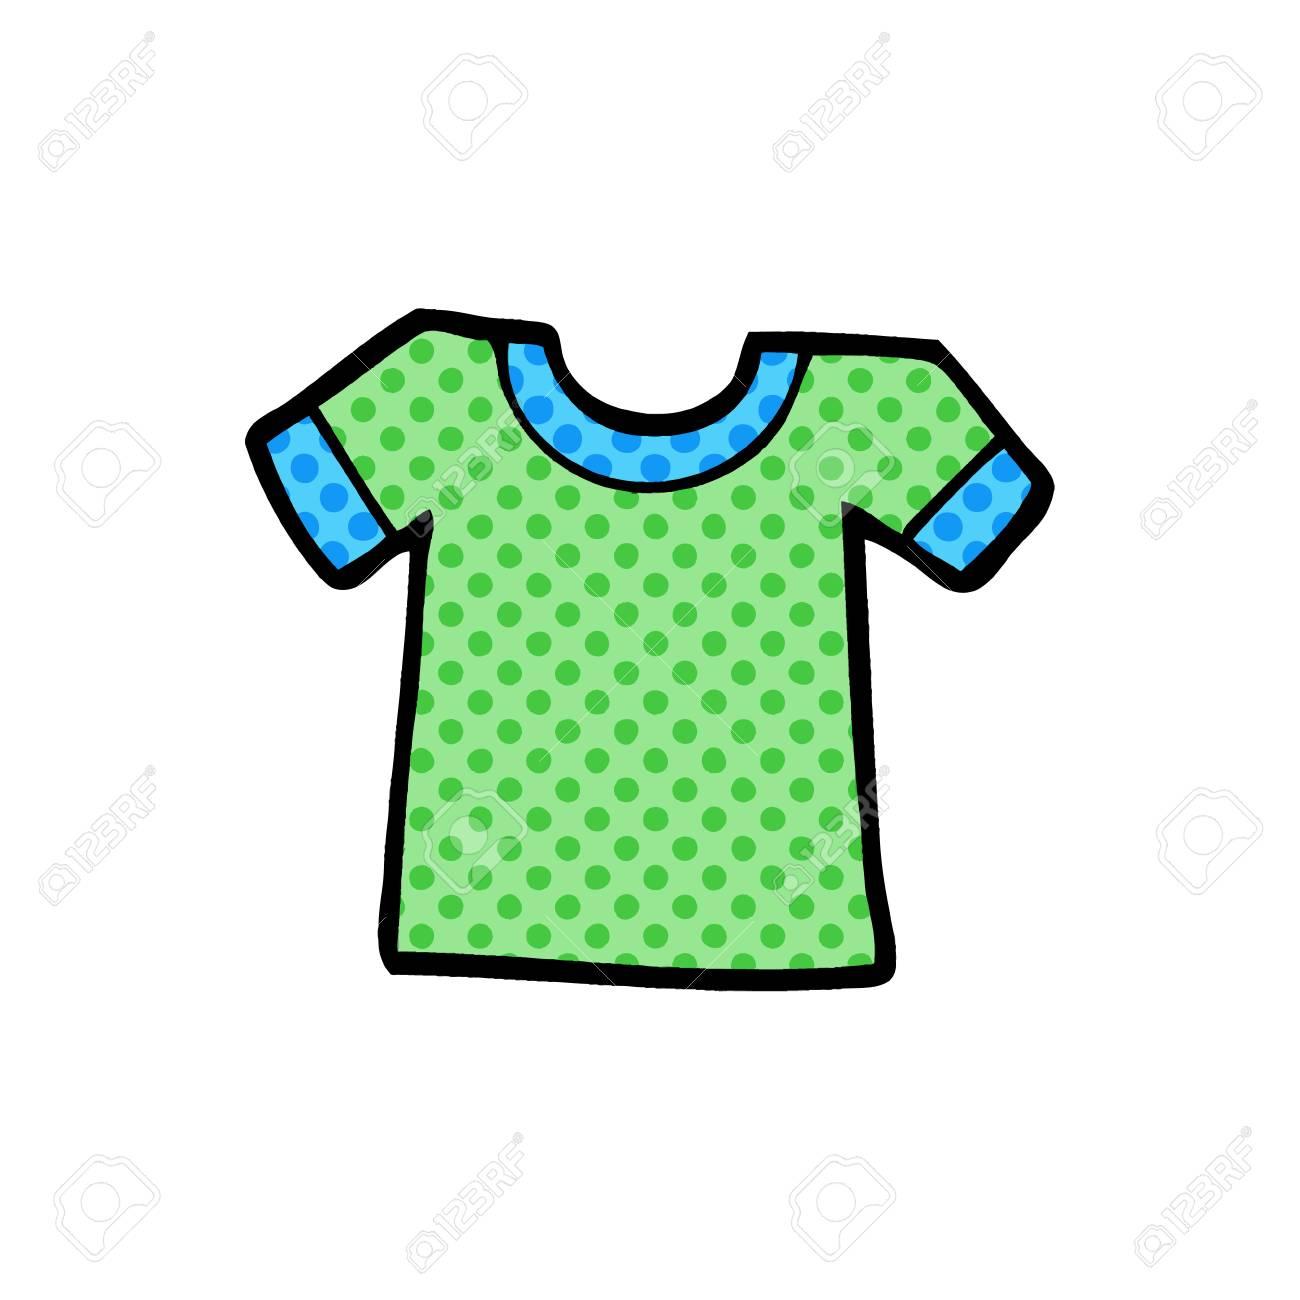 936980c69 Cartoon tee shirt illustration on white background. Stock Vector - 95663933